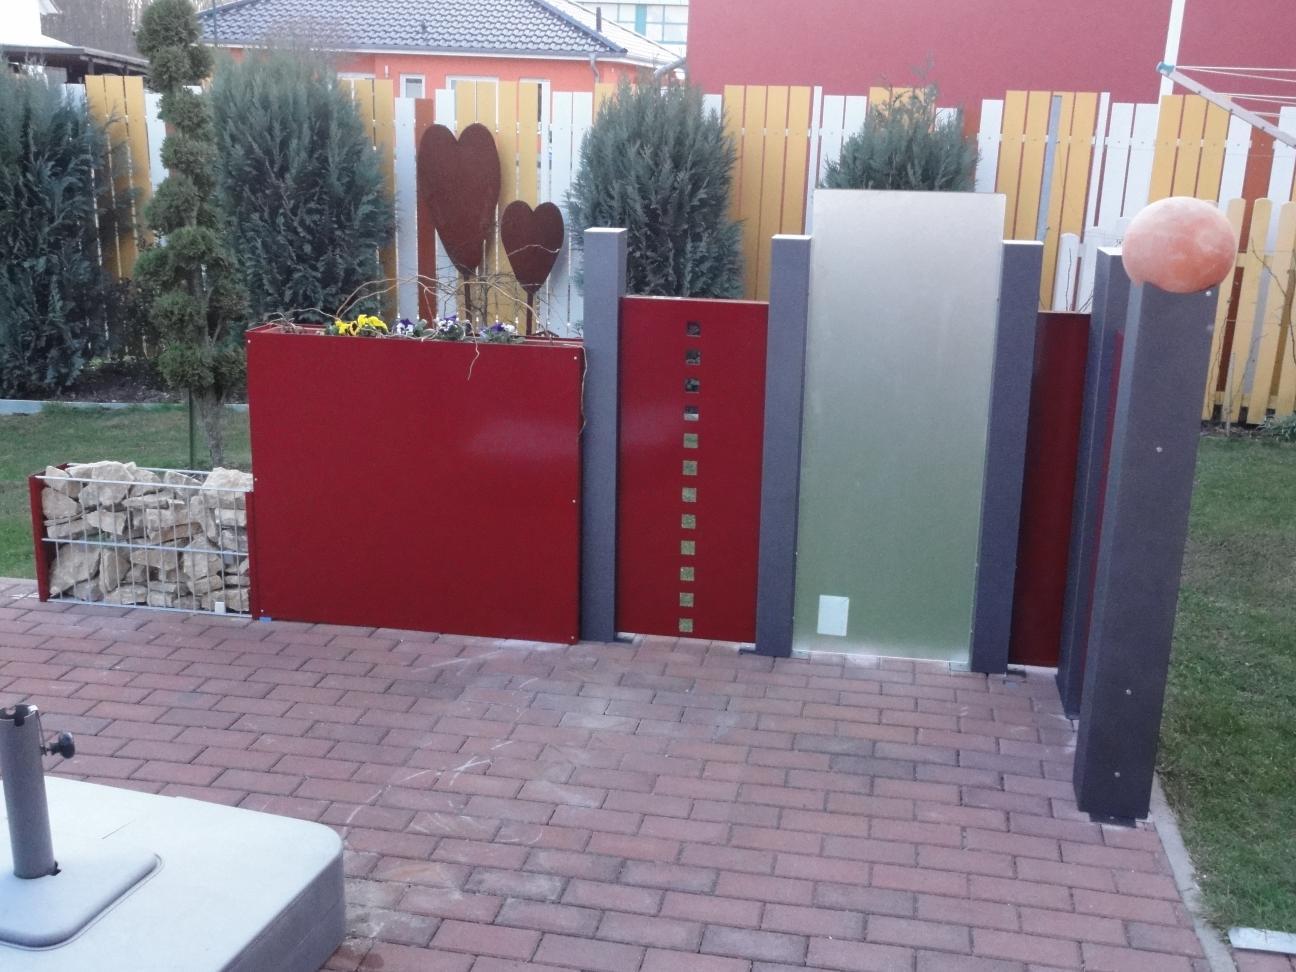 soloblech modular dekorstanzung 155 x 42 cm alles f r haus und garten aus metall. Black Bedroom Furniture Sets. Home Design Ideas